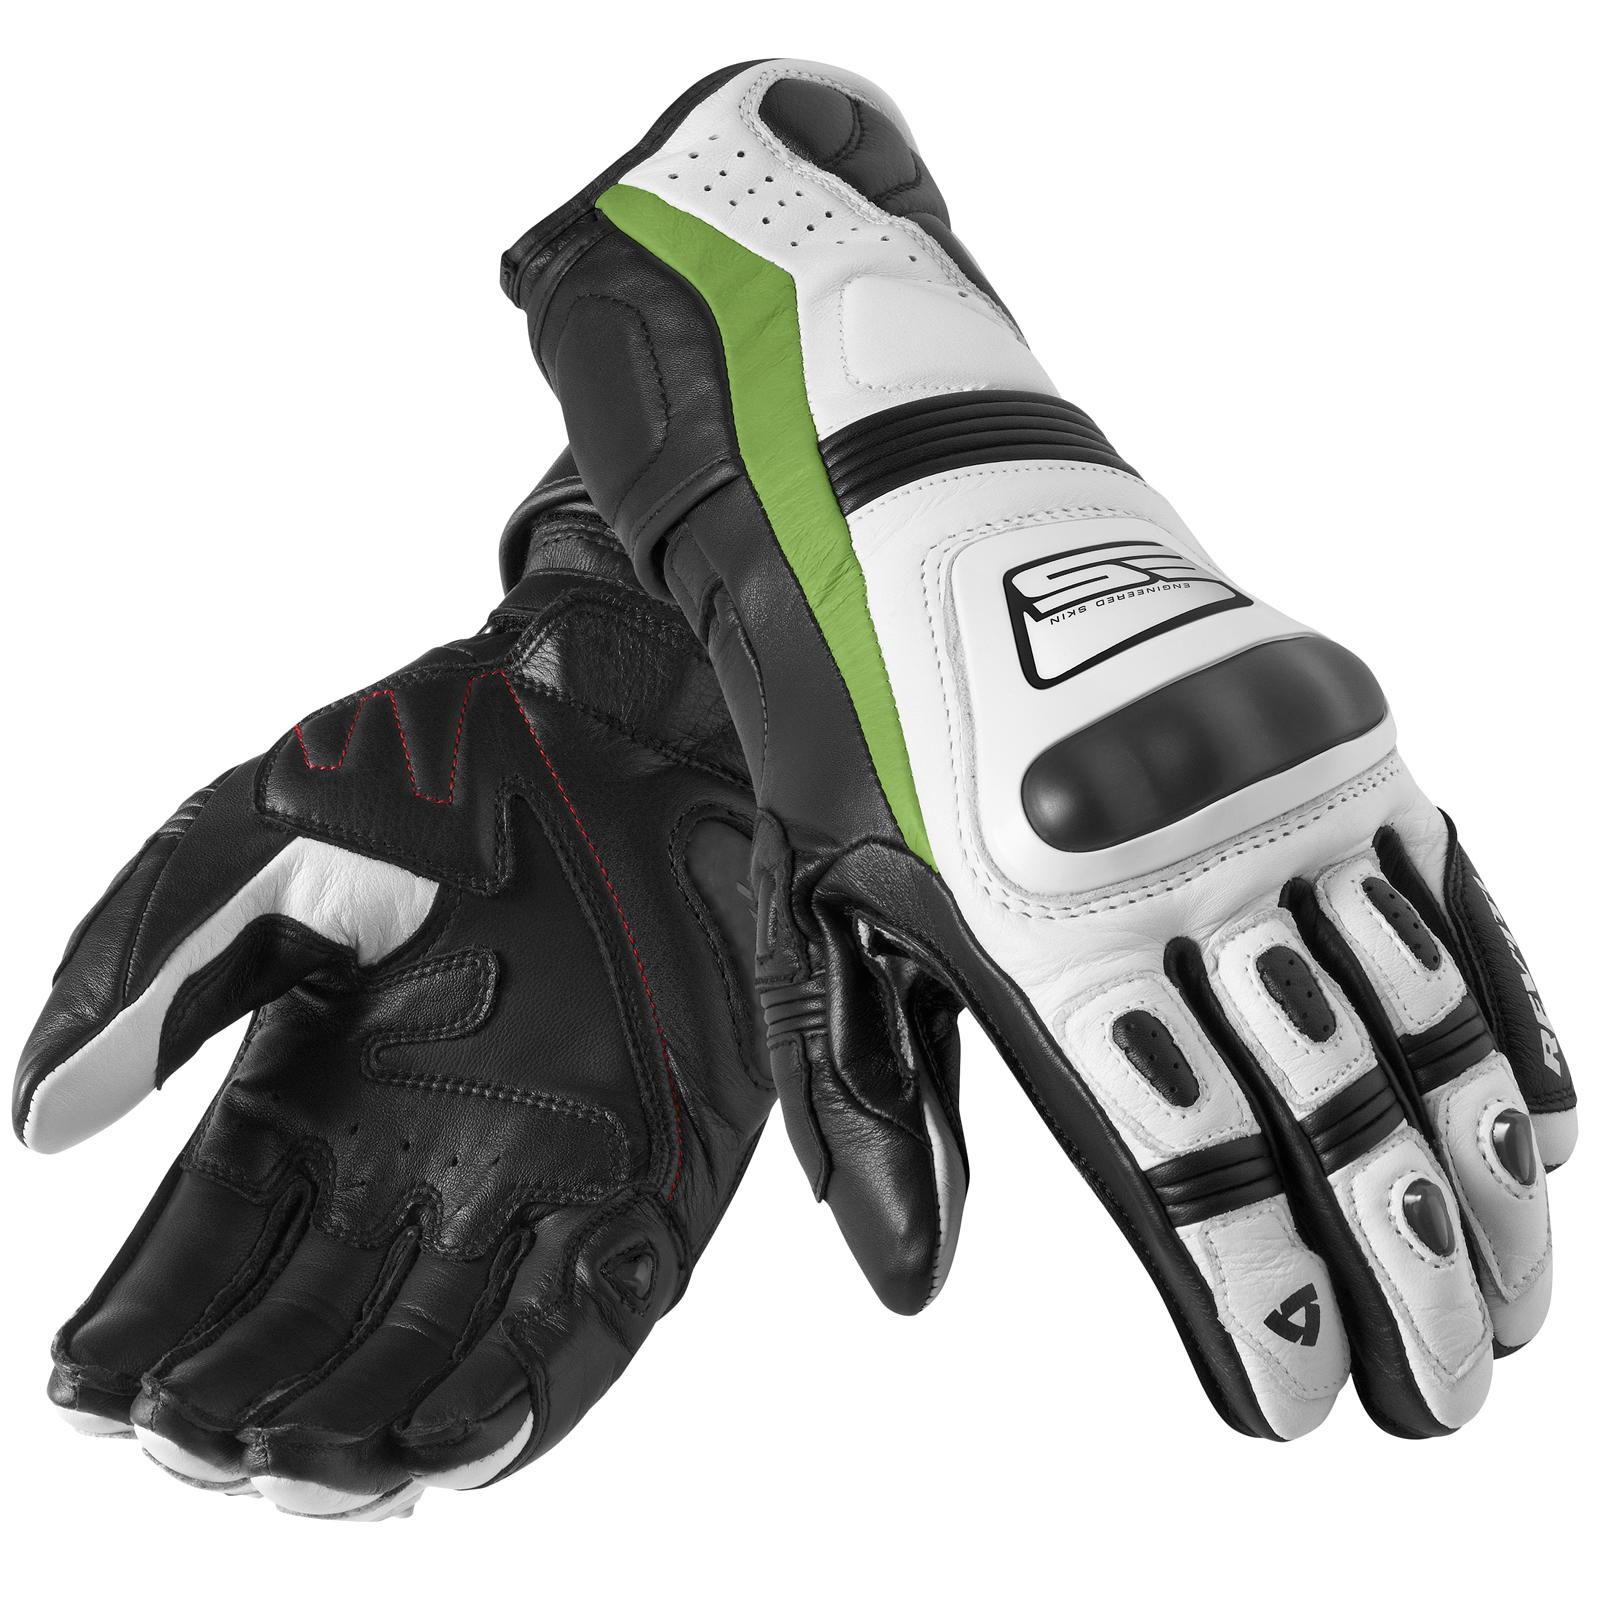 Motorcycle gloves for summer - Thumbnail 5 Thumbnail 6